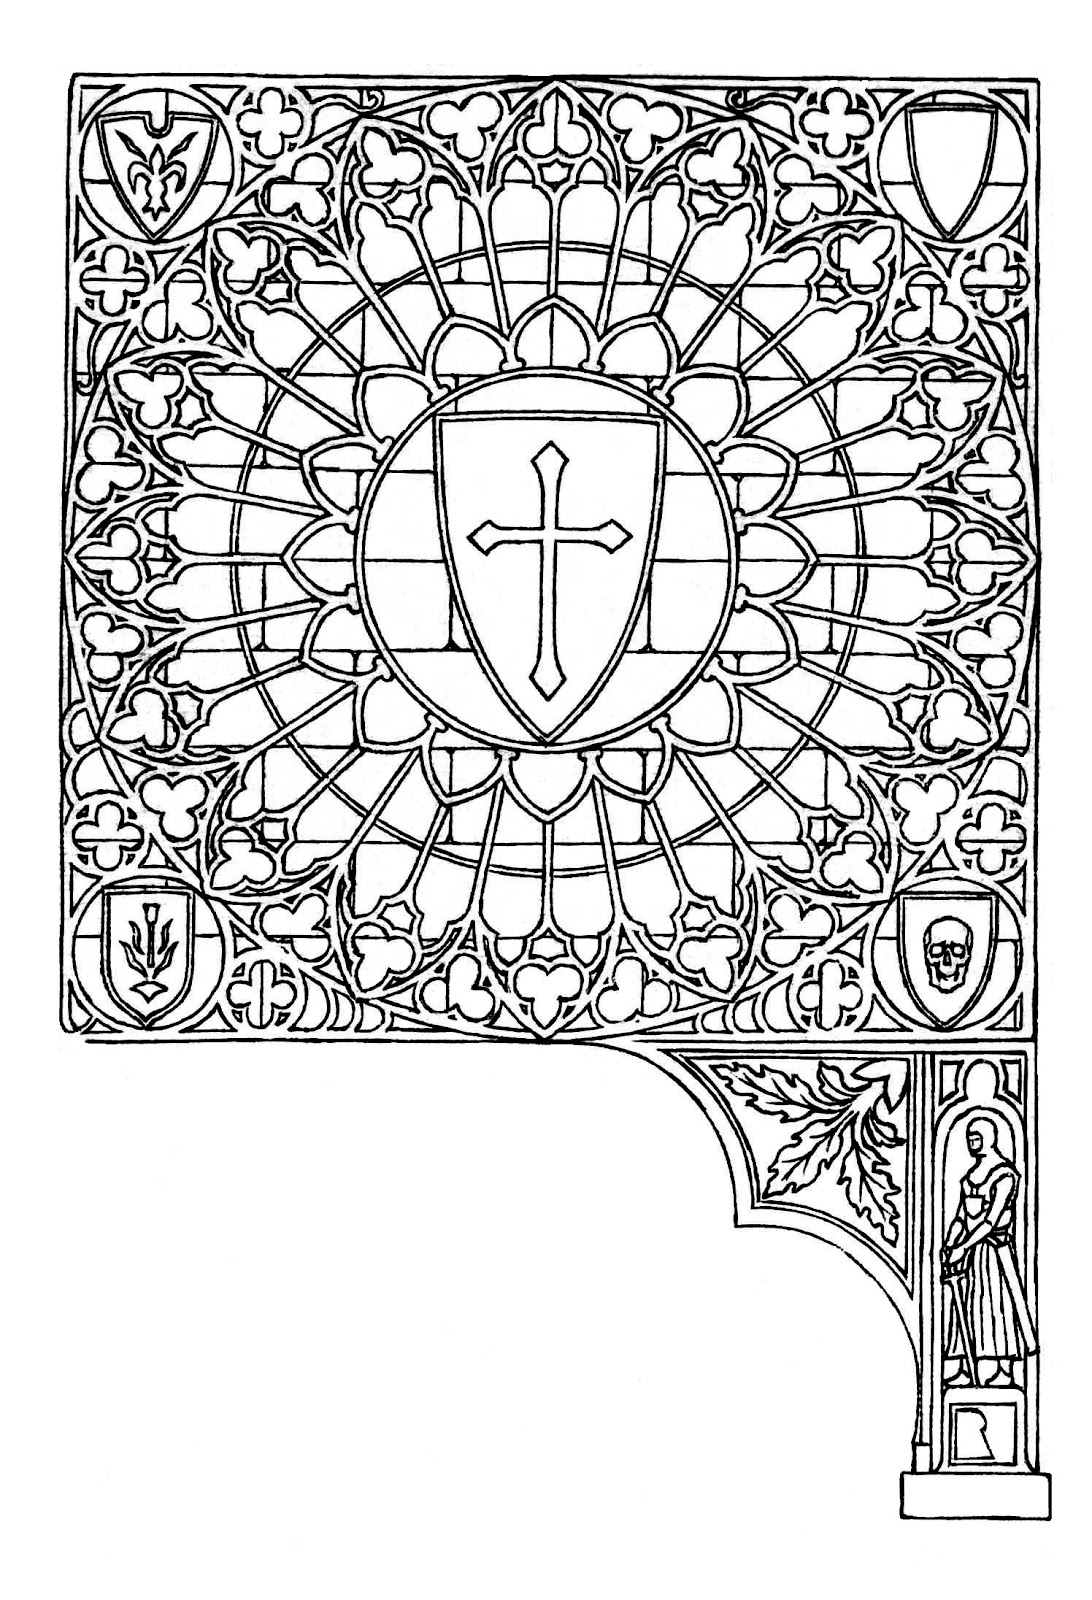 GÓTIKUS SAROKDÍSZ II (WITCHES V).jpg